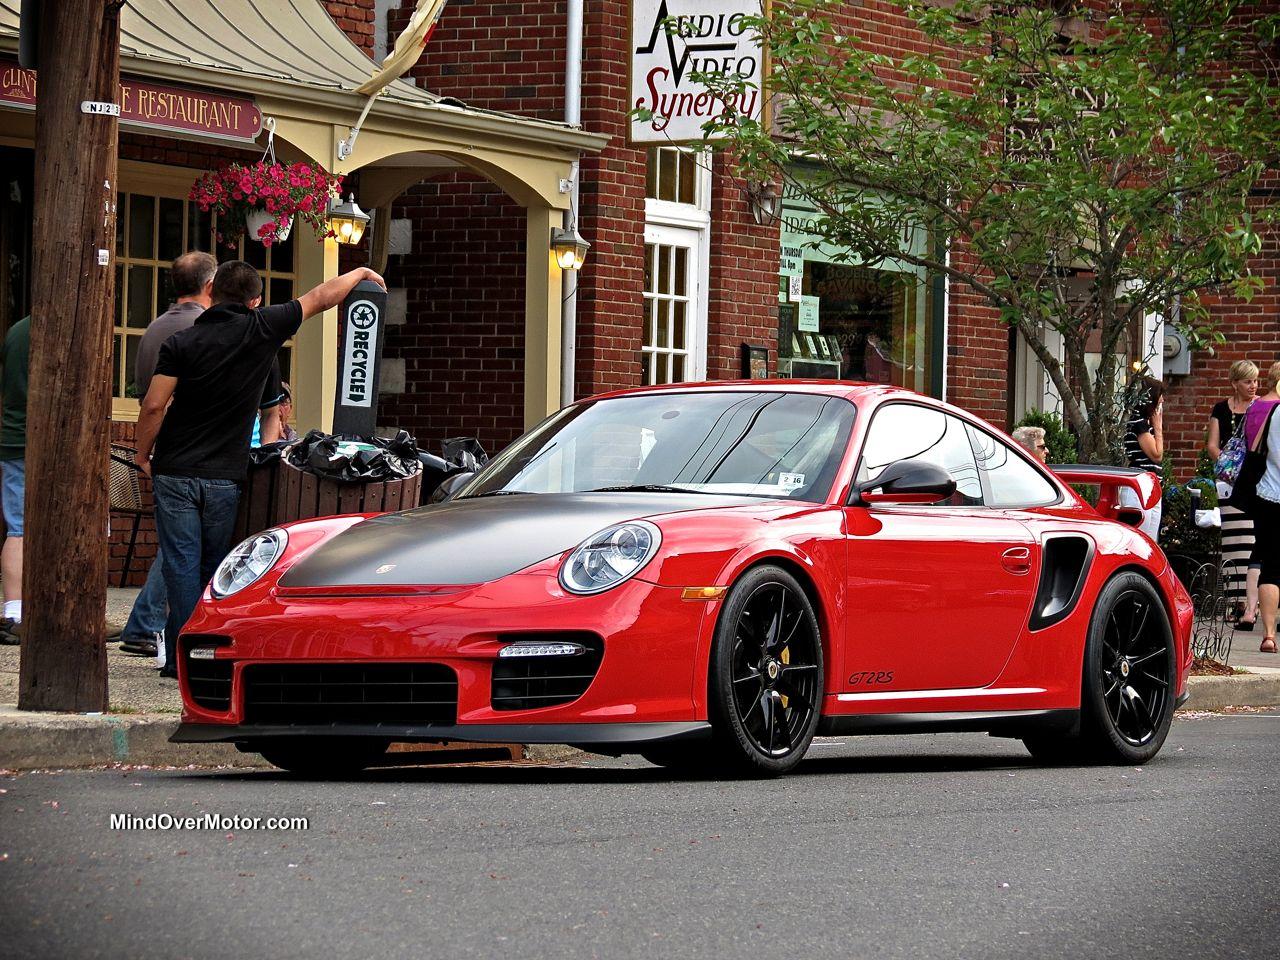 Porsche 997 GT2 RS in Clinton, NJ